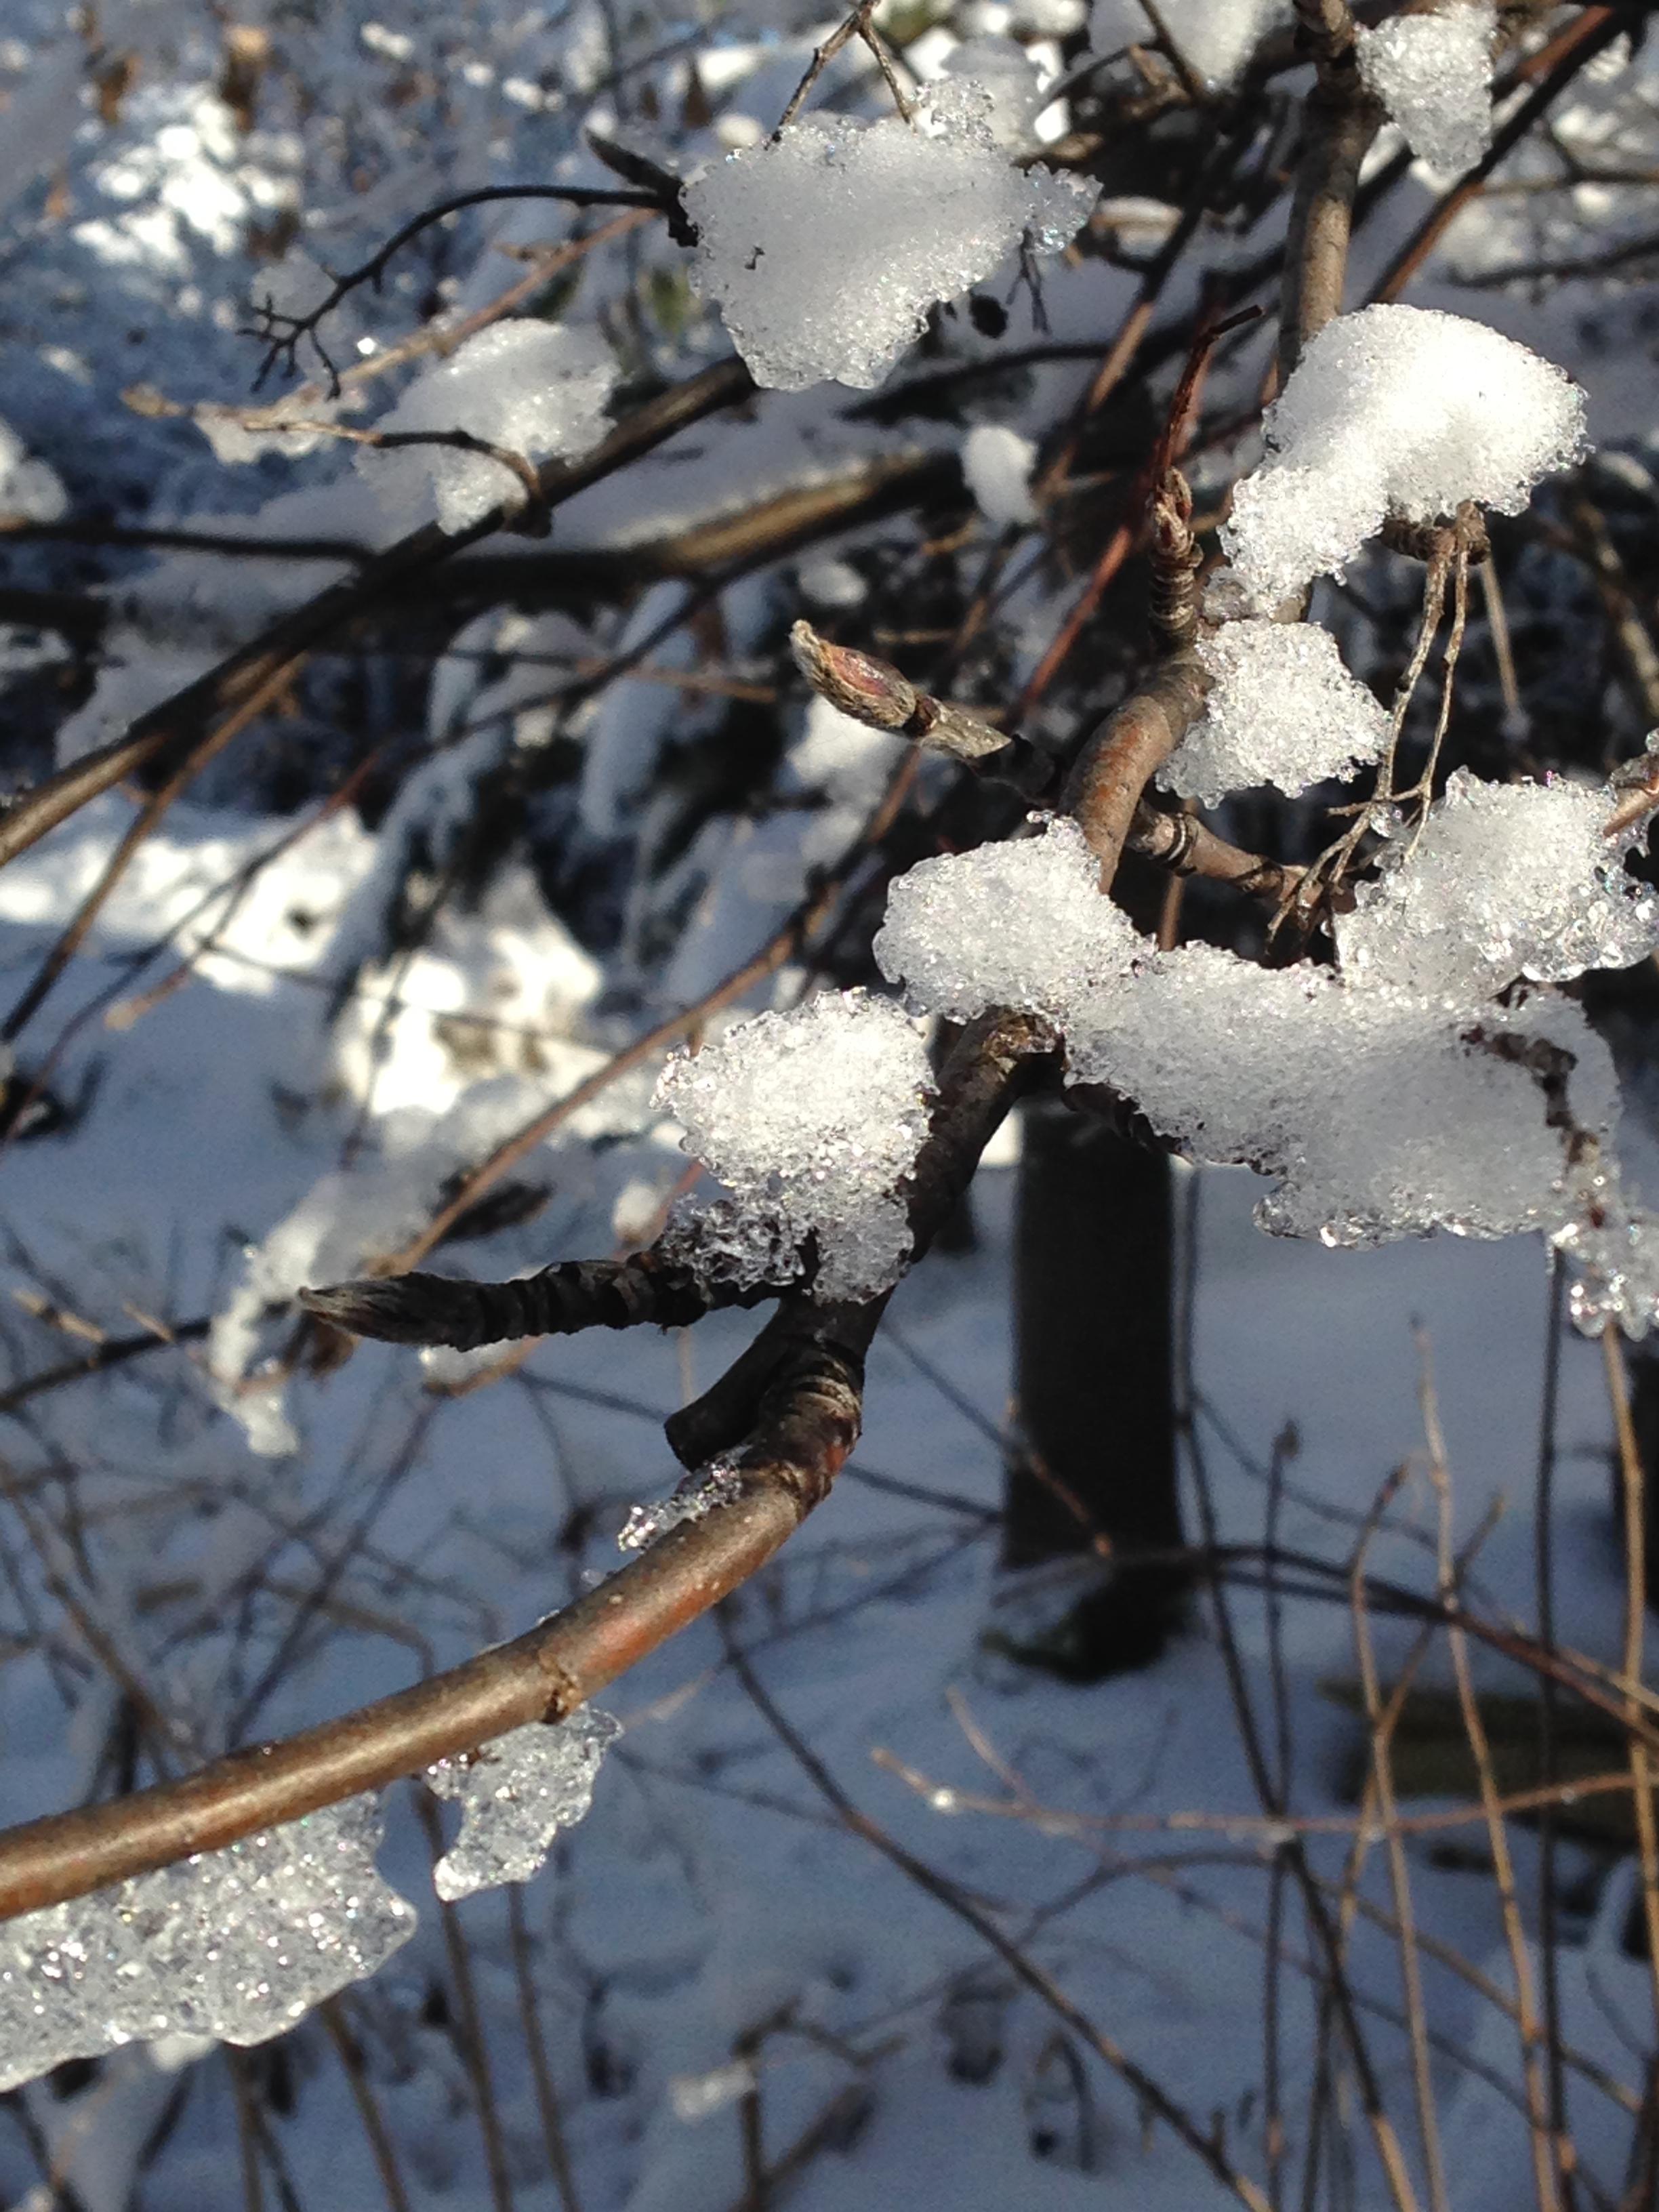 Snowday 2014-12-19 12.47.33 (2)